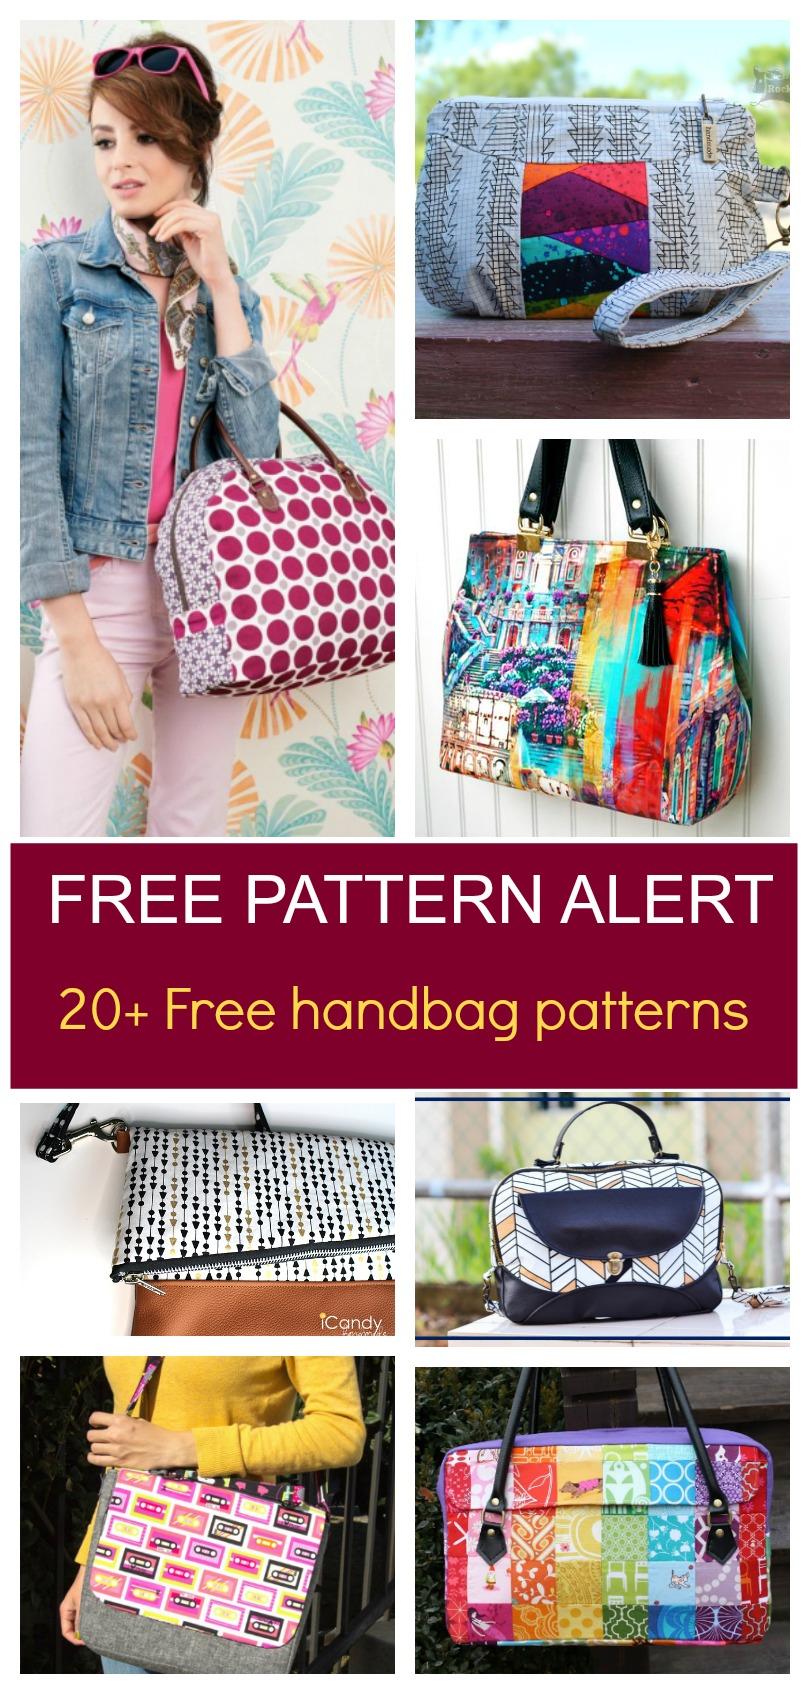 Free Pattern Alert: 20+ Handbag Sewing Patterns   On The Cutting - Free Printable Purse Patterns To Sew